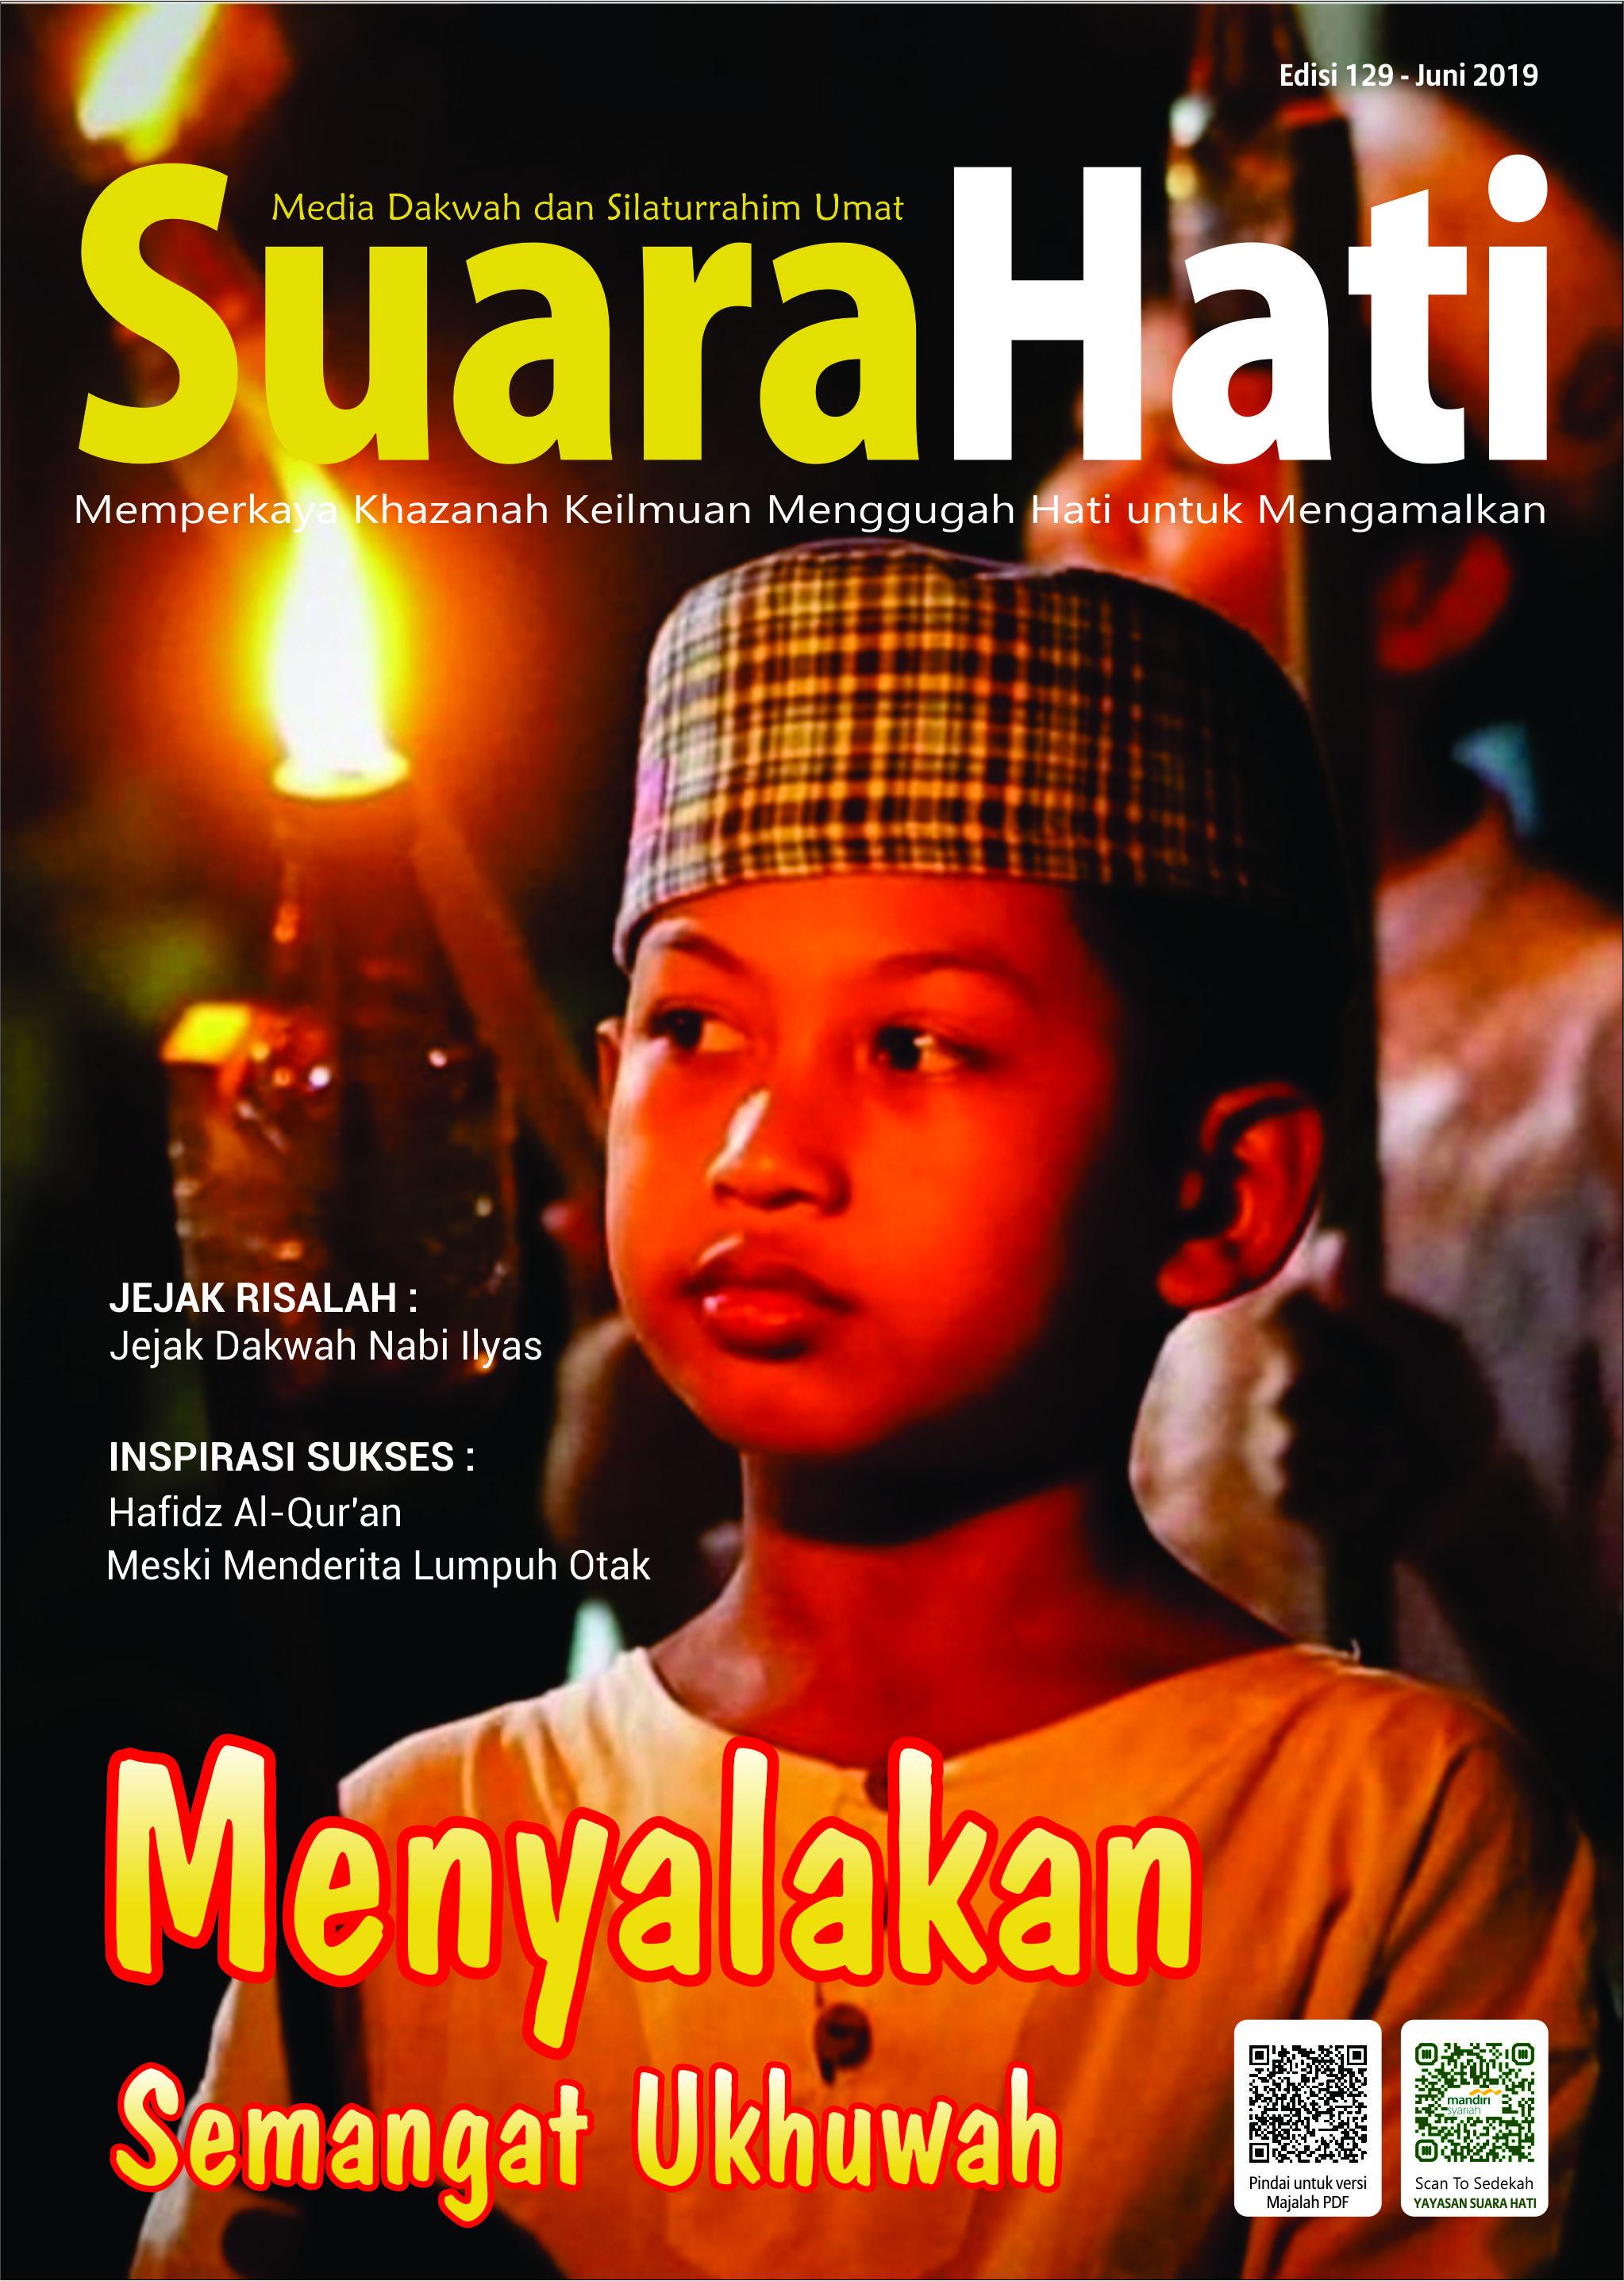 Majalah Suara Hati Edisi Juni 2019